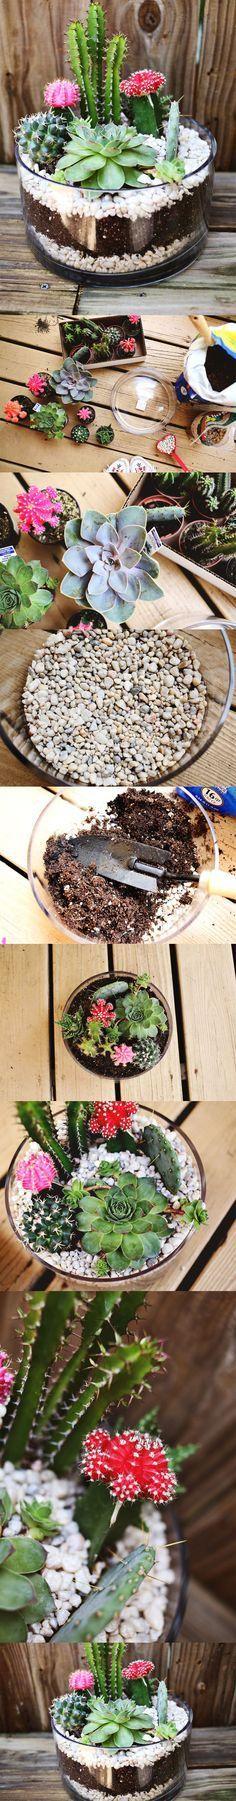 How to build a terrarium! The steps and patterns to inspire you! - a terrarium! cacti terrarium, succulent container garden, succulents, DIY terrarium Source by granbeth -